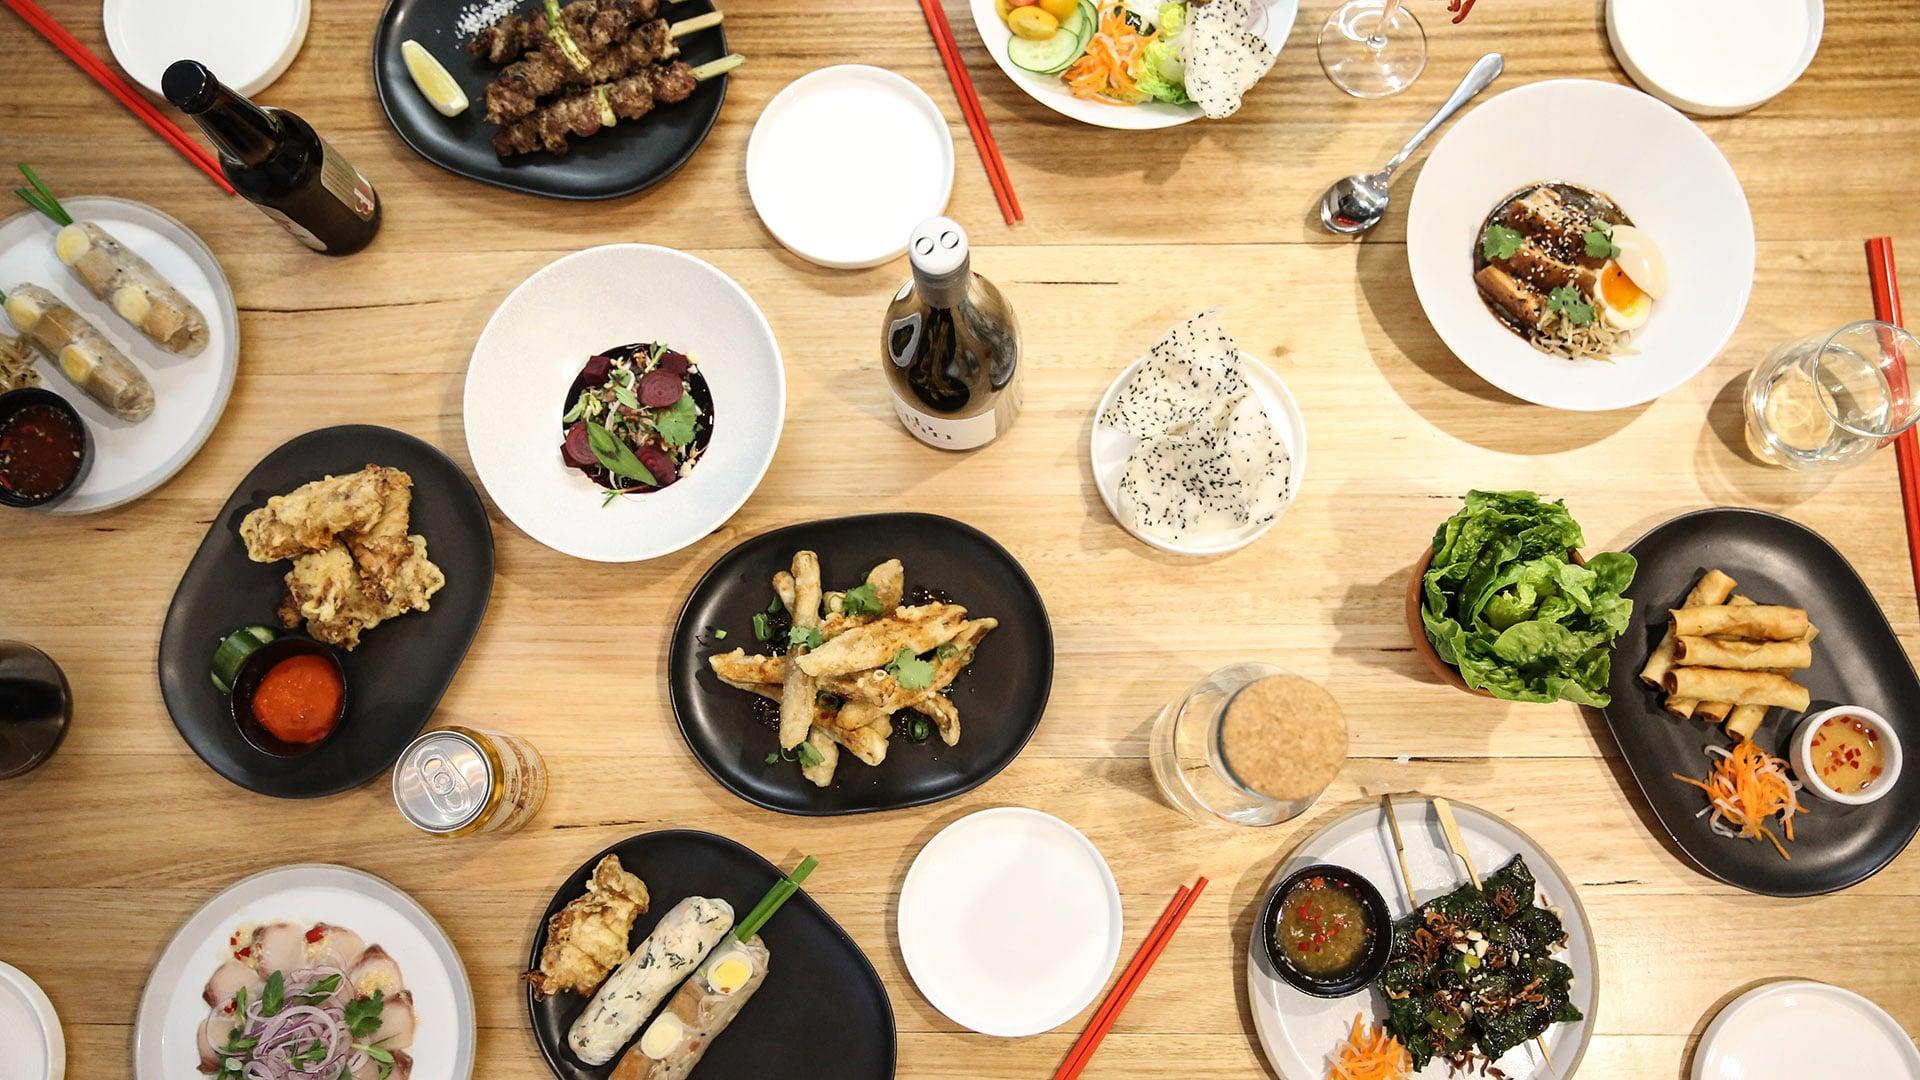 Vietnam Food And Beverage Insights Q1 2017